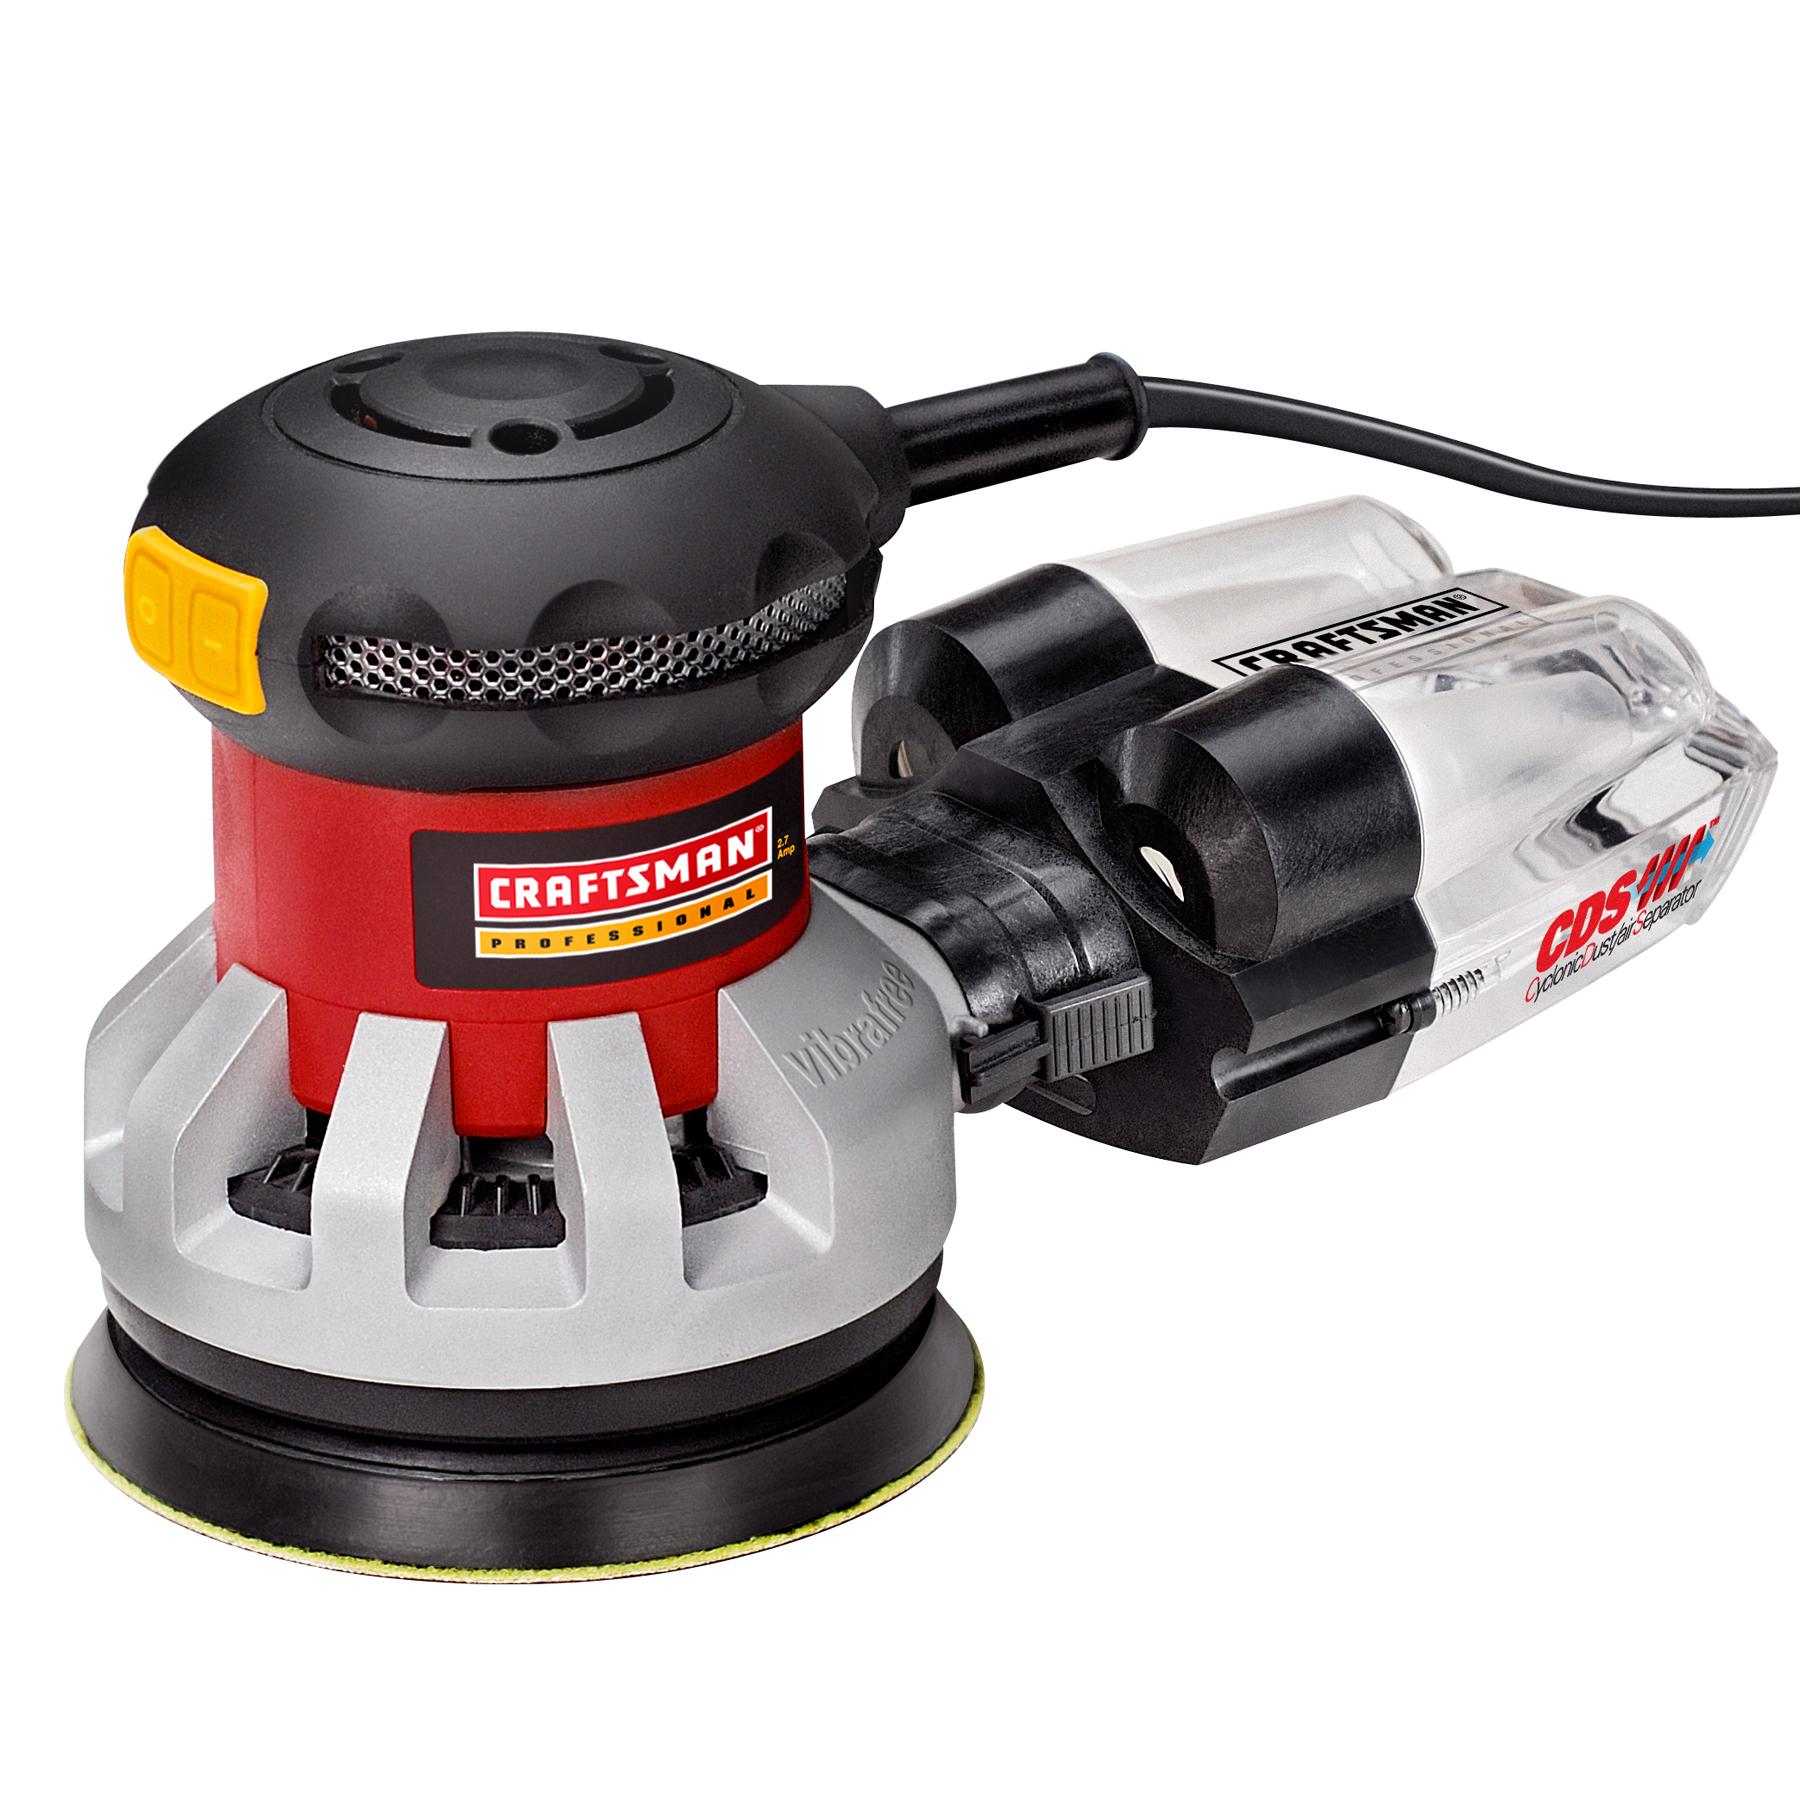 Craftsman Professional - 25927 Vibrafree 2.7 Amp Corded 5